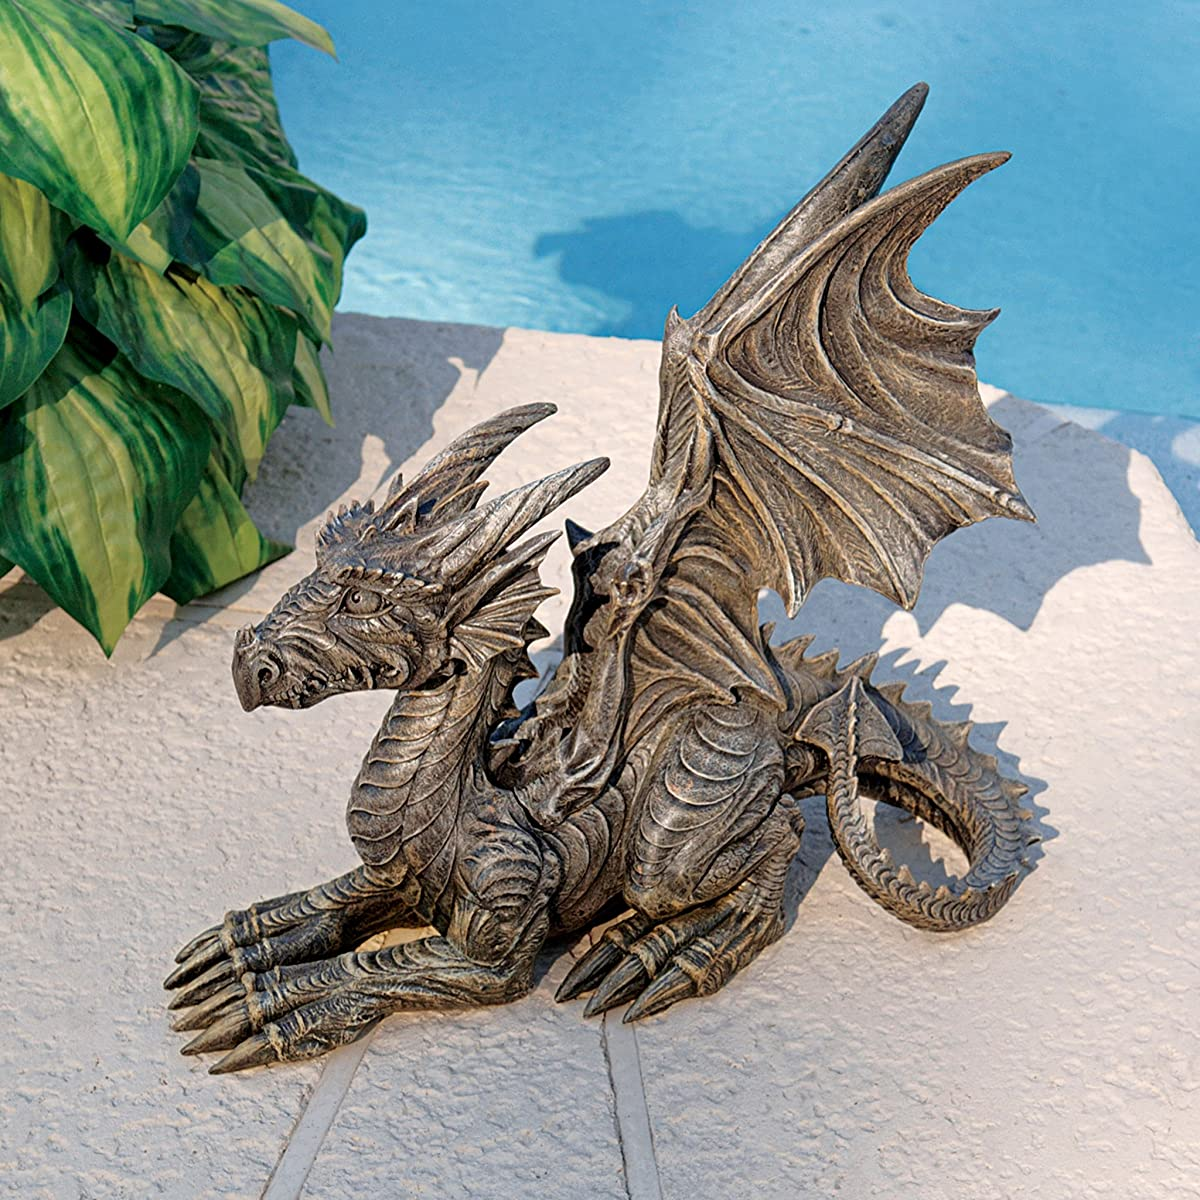 Design Toscano CL51642 Desmond The Dragon Gothic Decor Statue, 16 Inch, Greystone